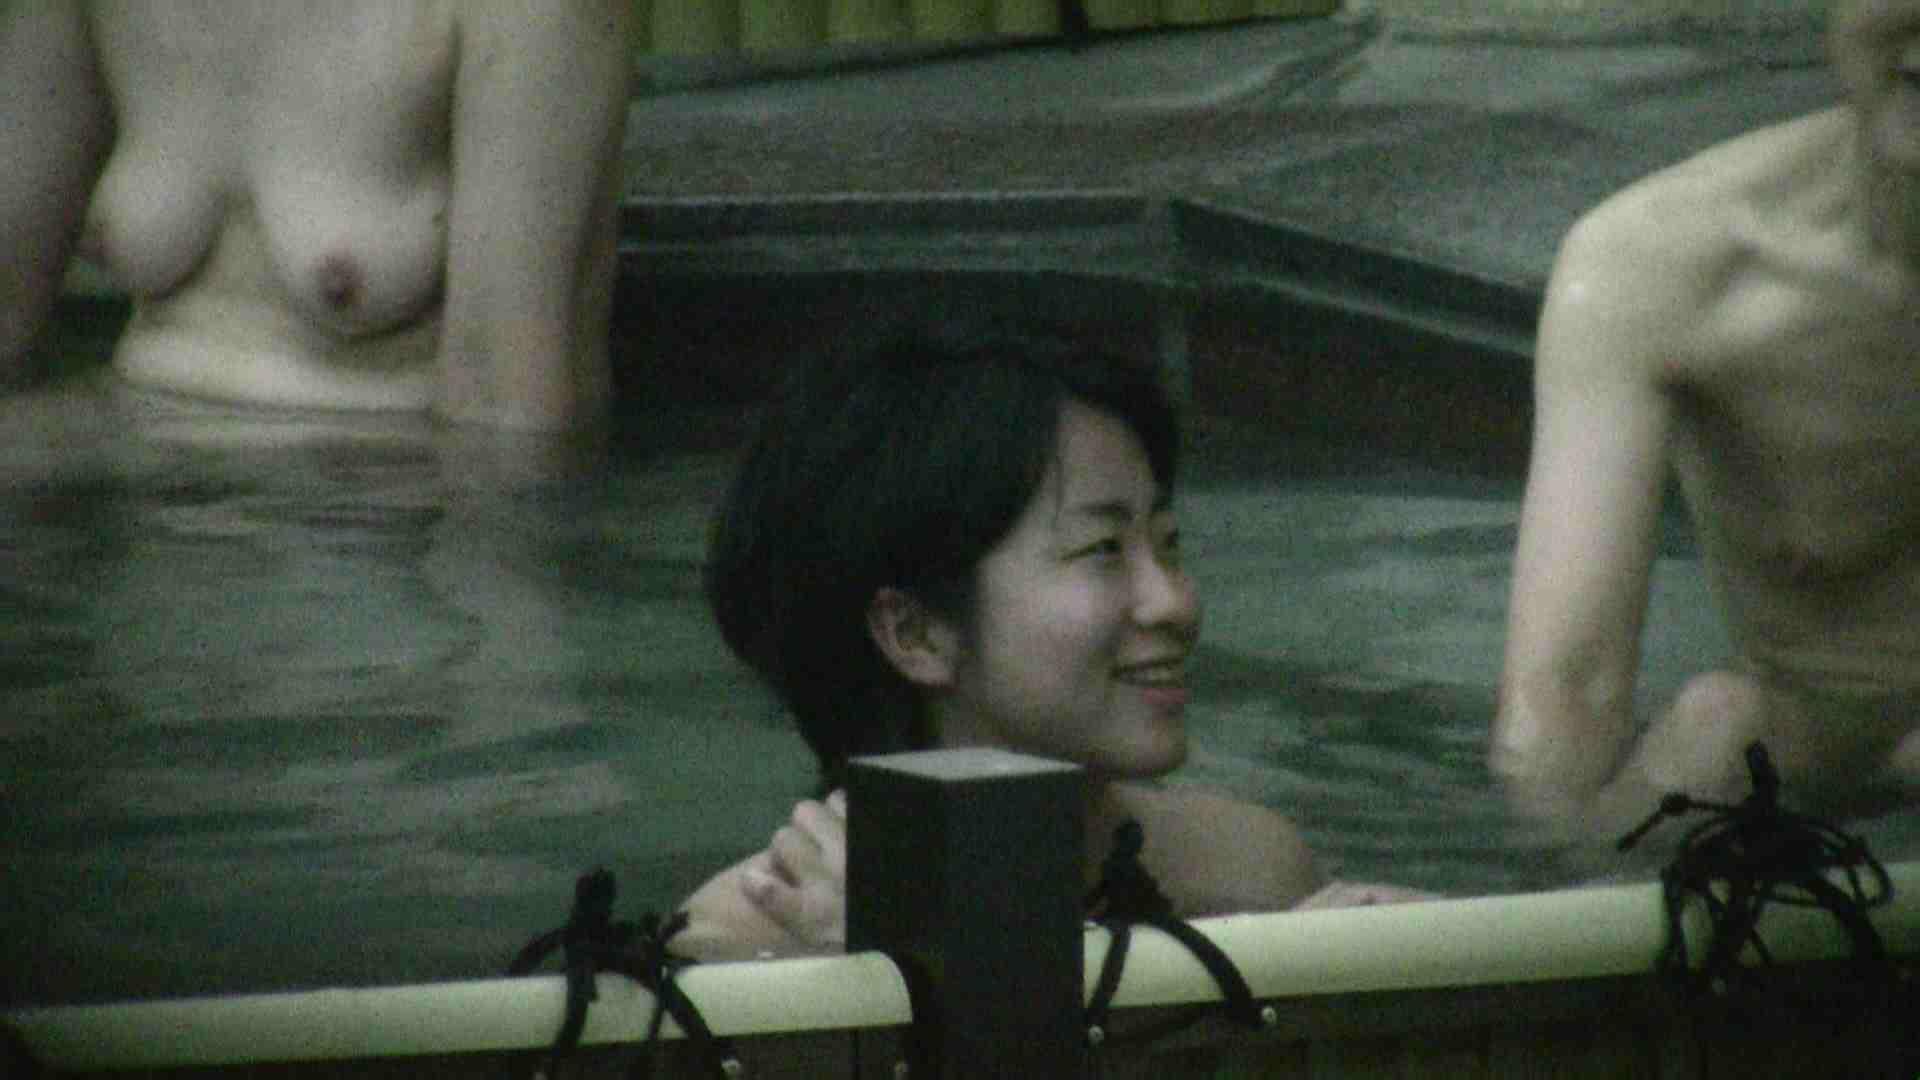 Aquaな露天風呂Vol.112 0 | 0  68連発 59